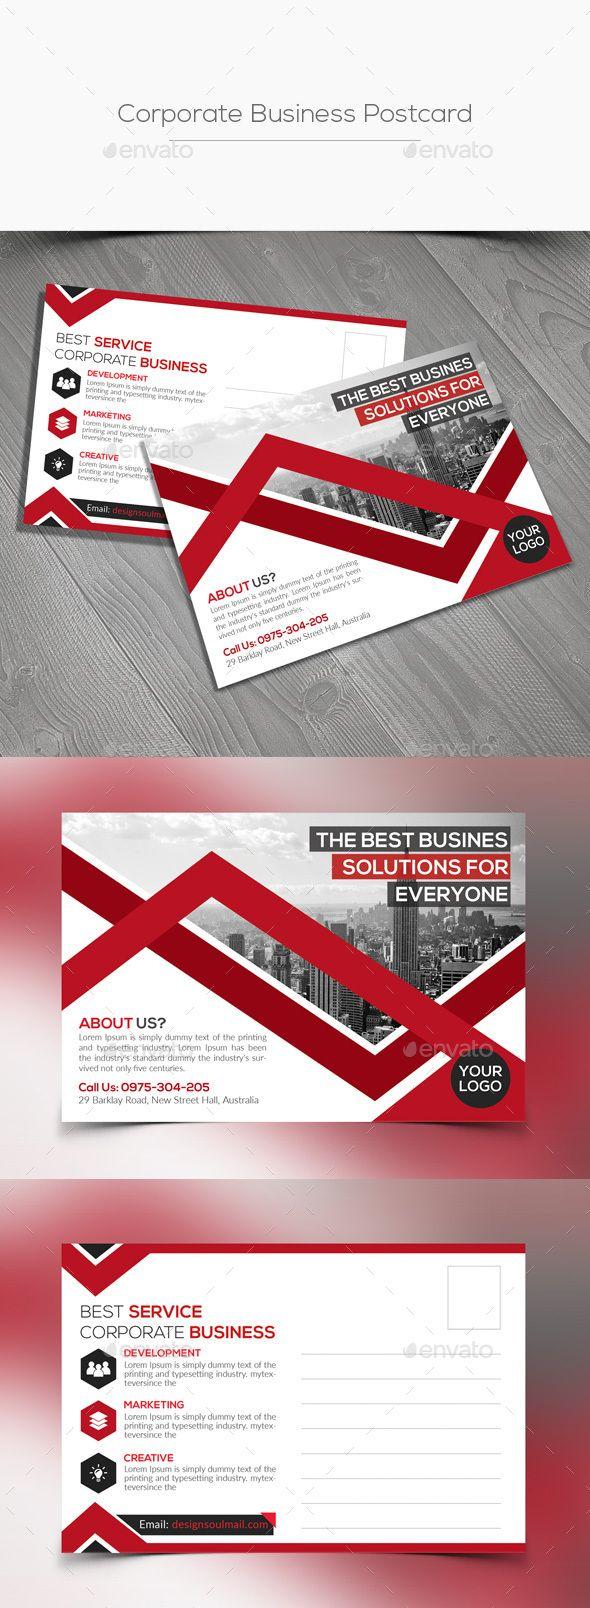 Design your own postcard australia – Best postcards 2017 photo blog